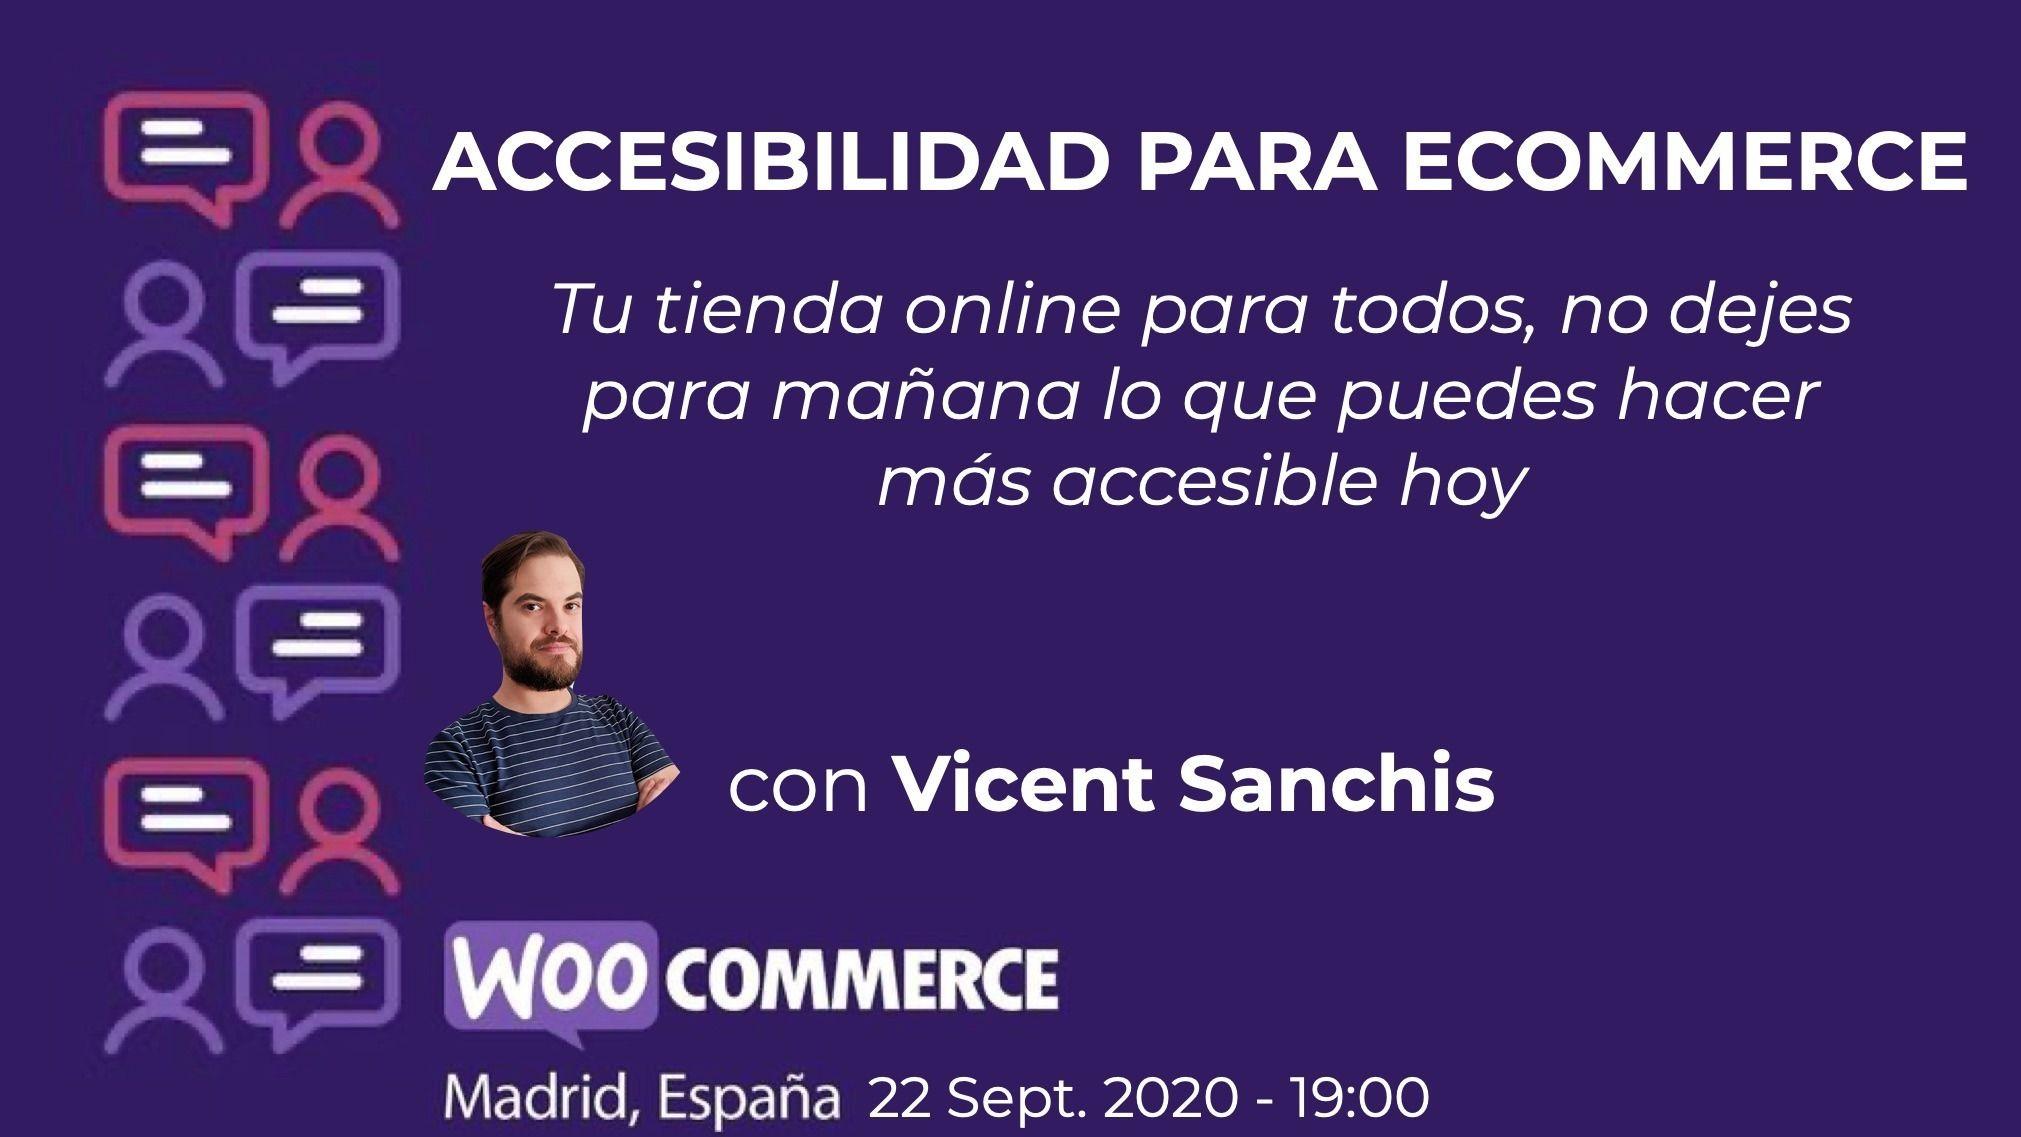 Accesibilidad en WooCommerce 2